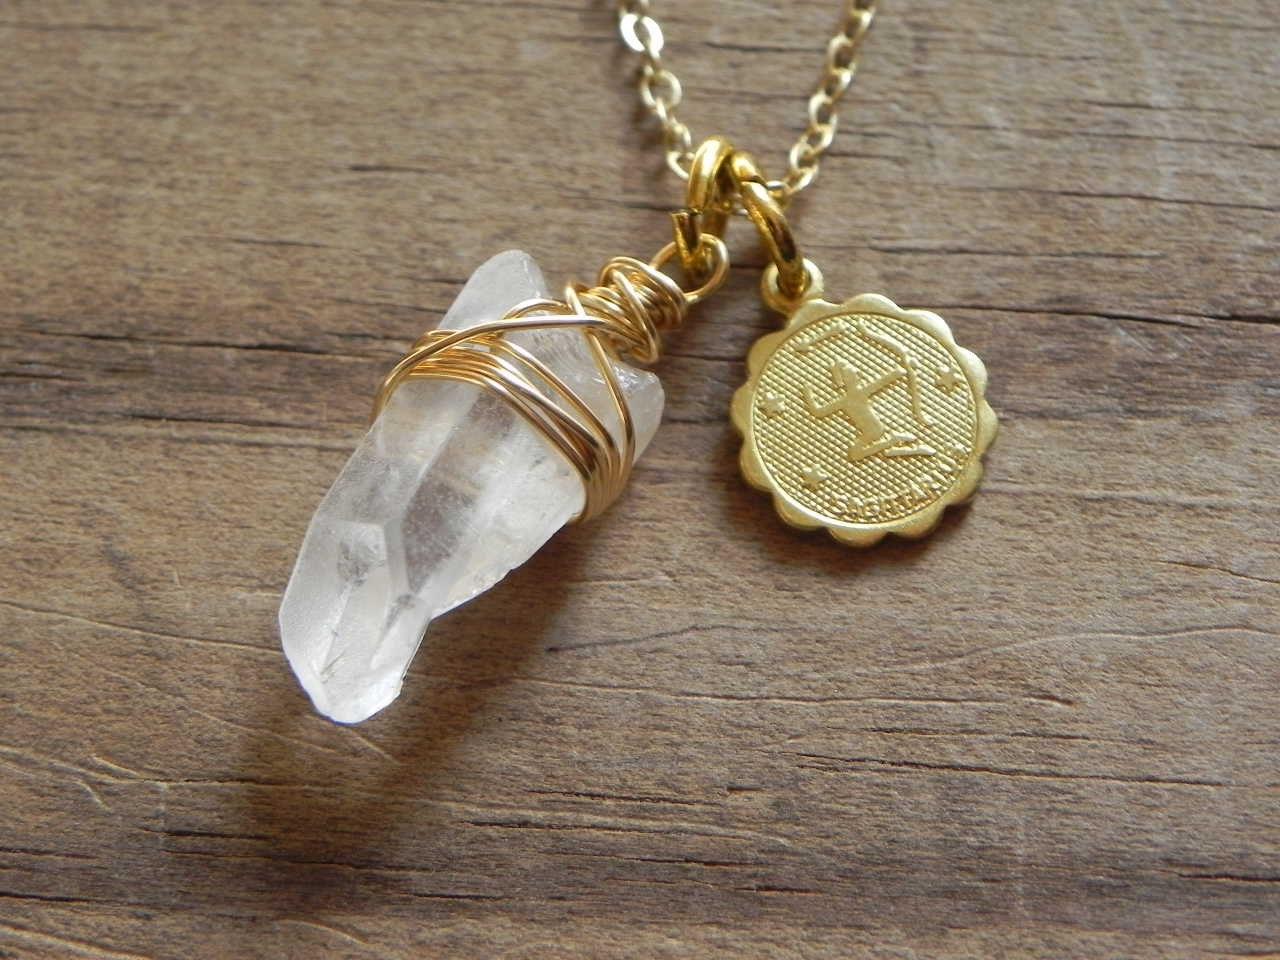 sagittarius necklace zodiac beadwork necklace astrological